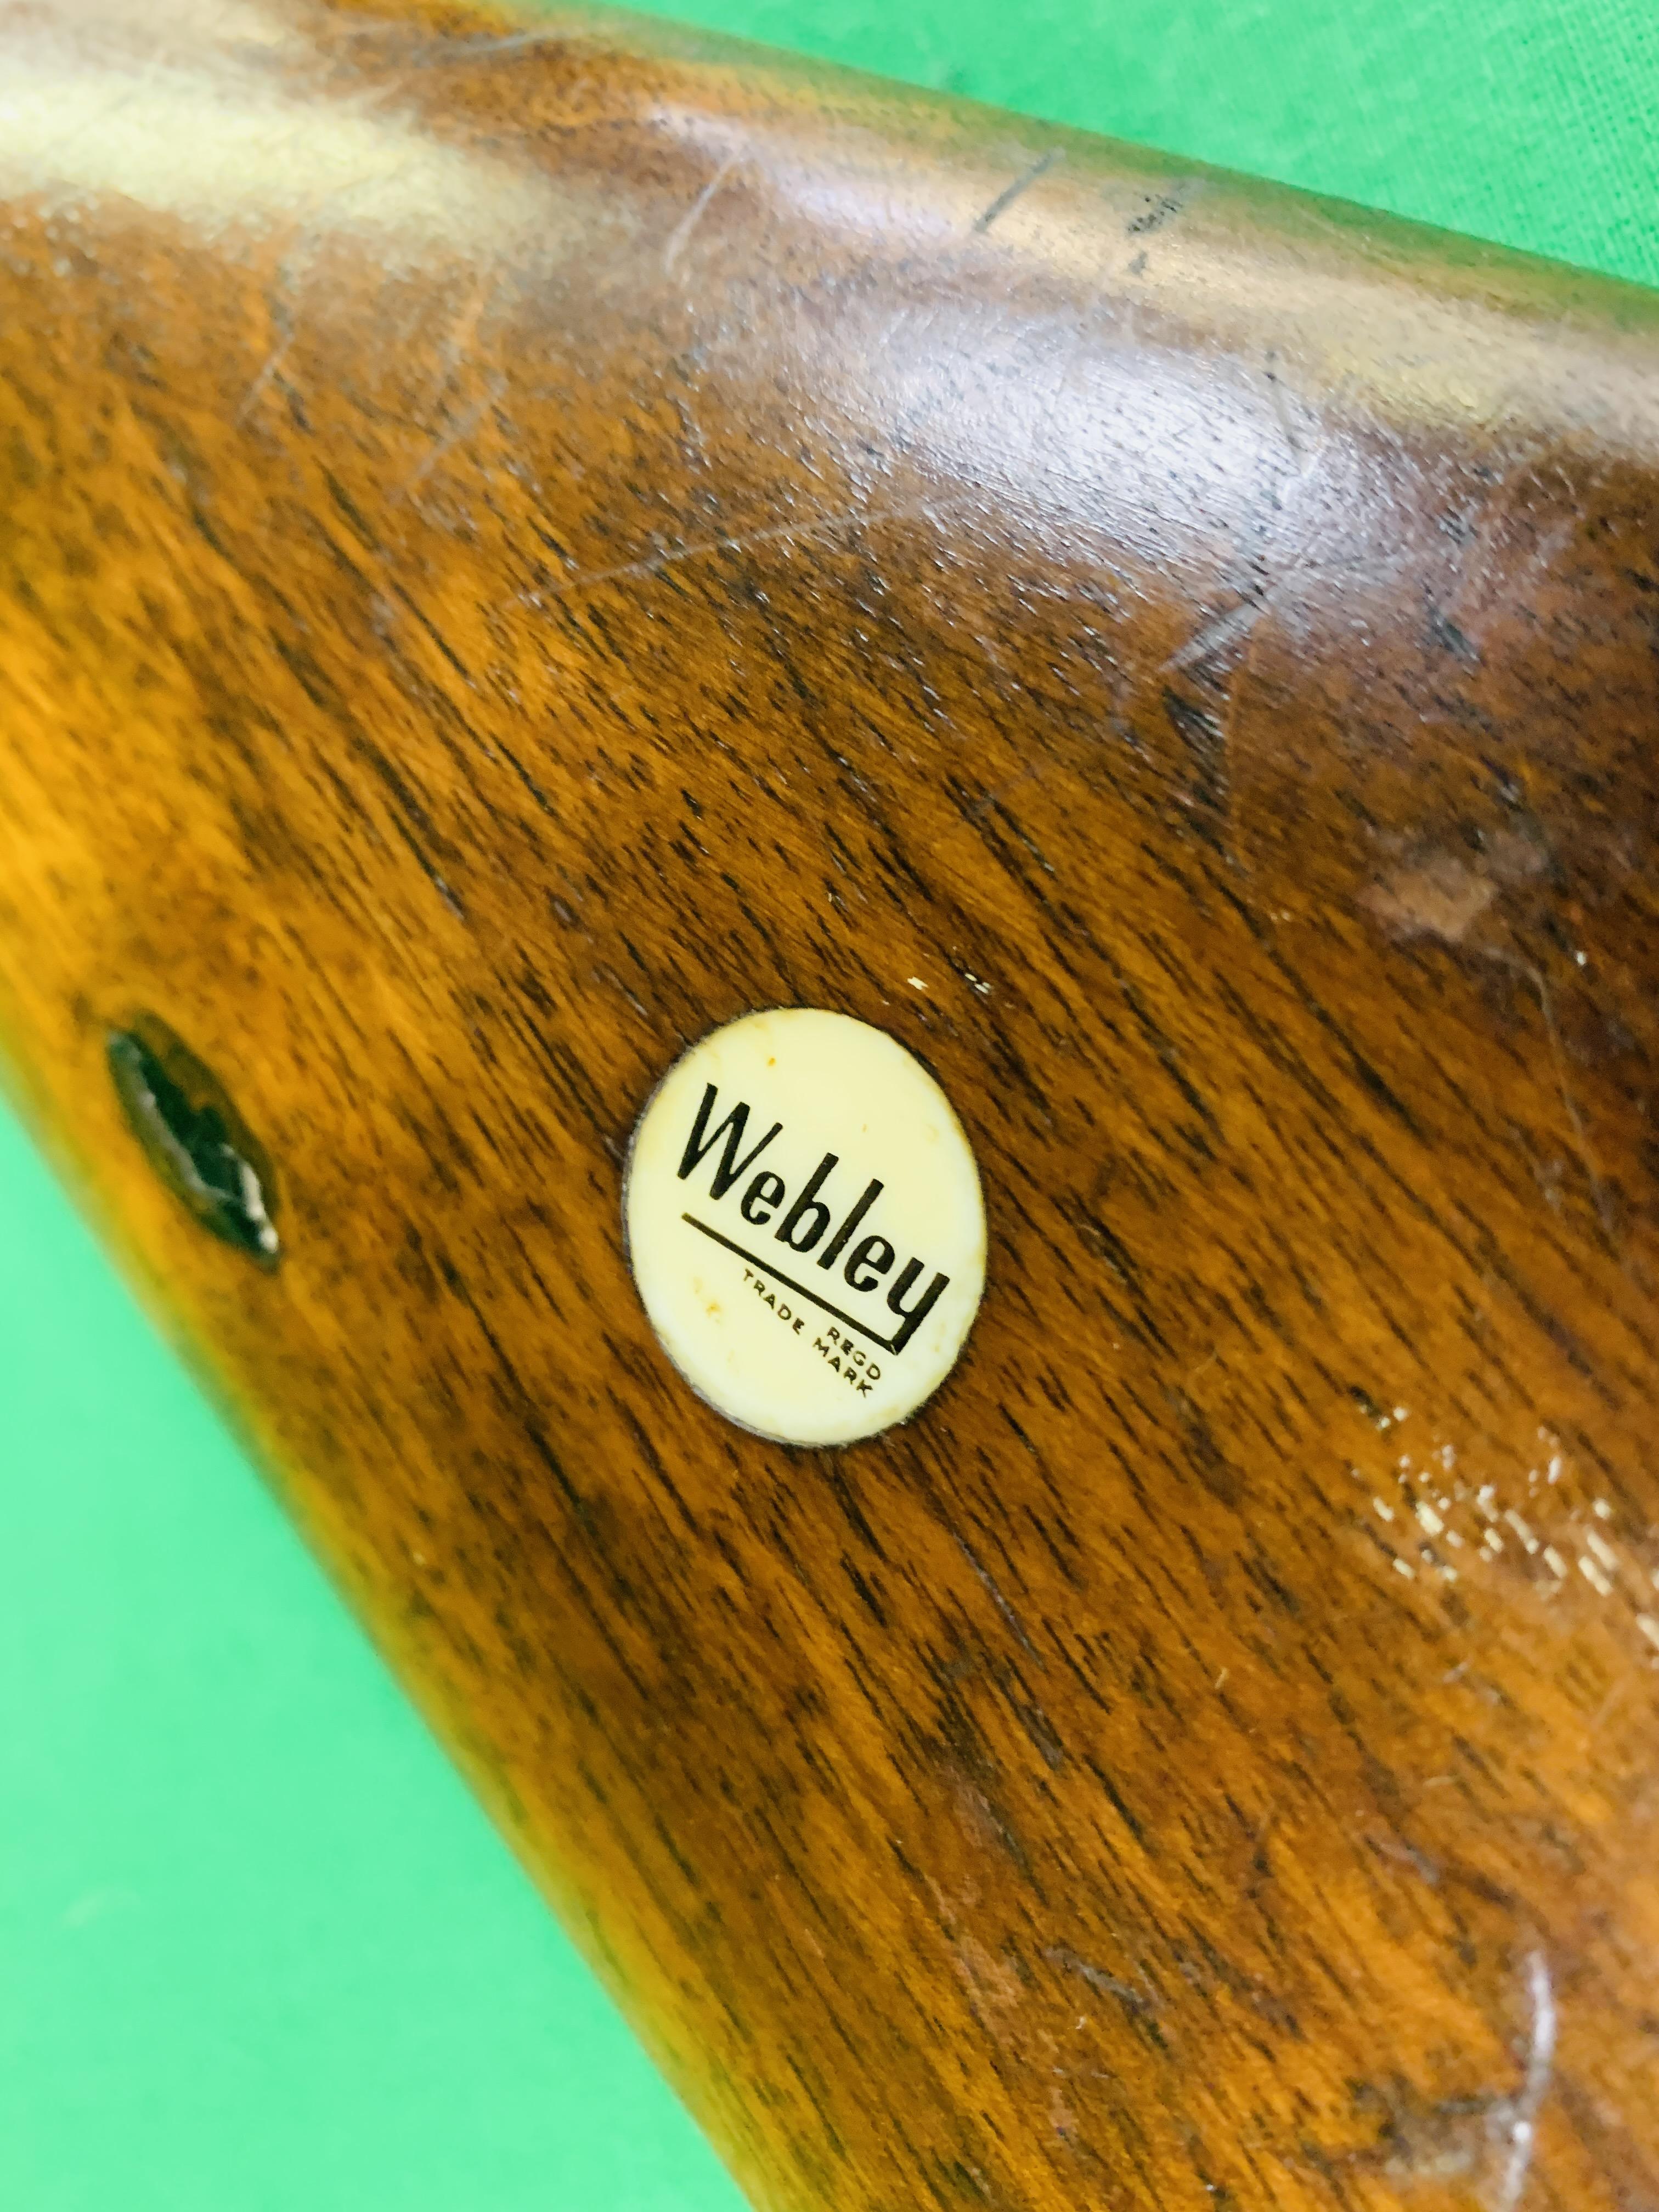 WEBLEY MARK 3 . - Image 11 of 11